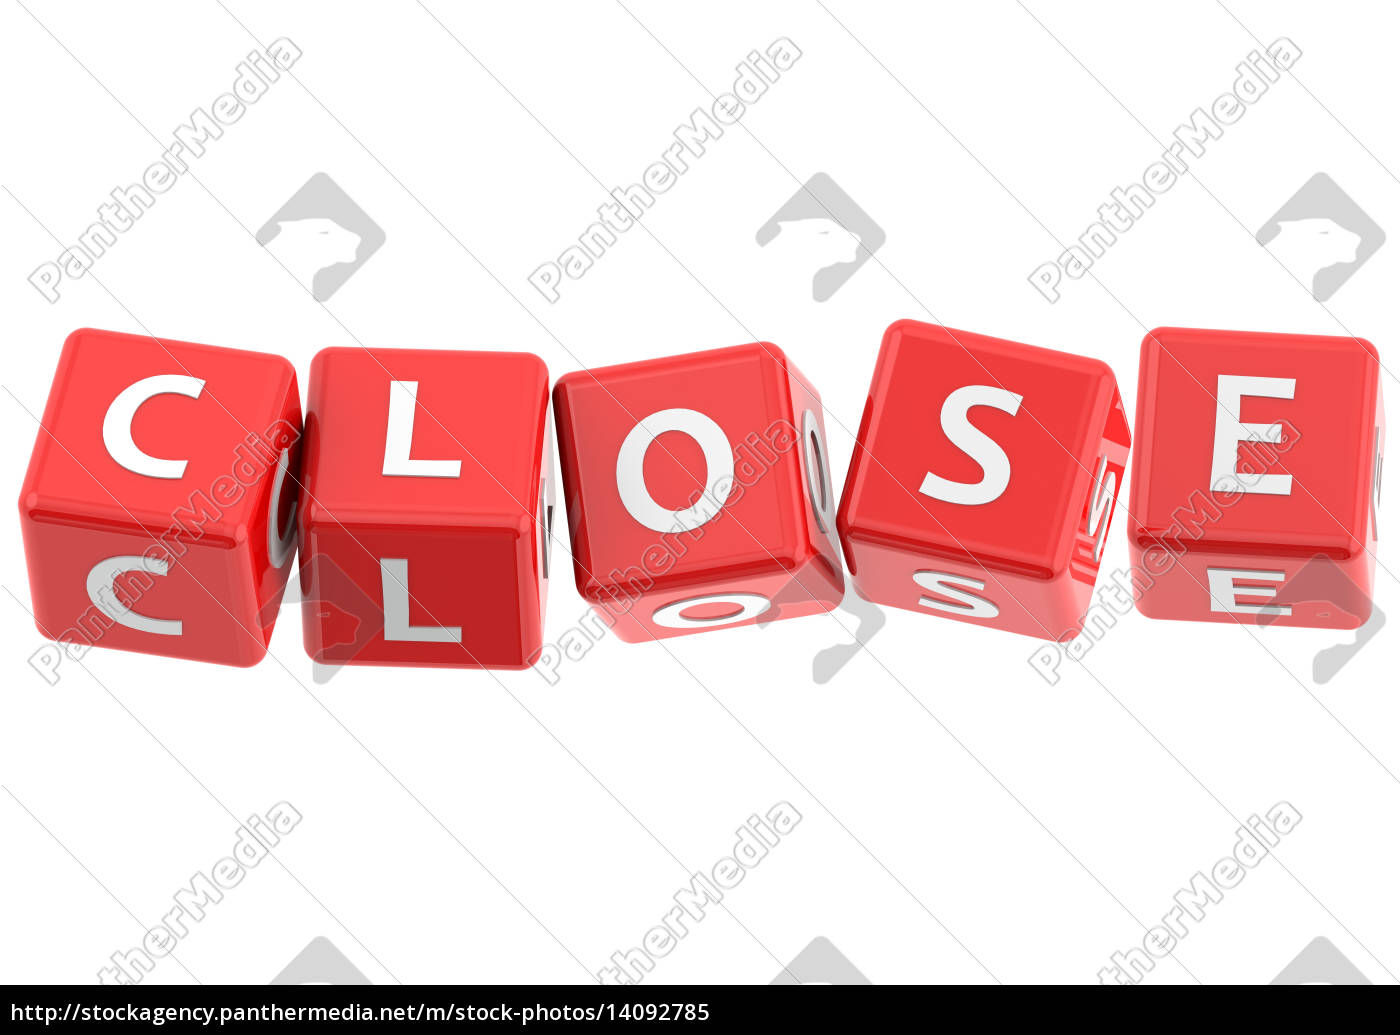 close, buzzword - 14092785